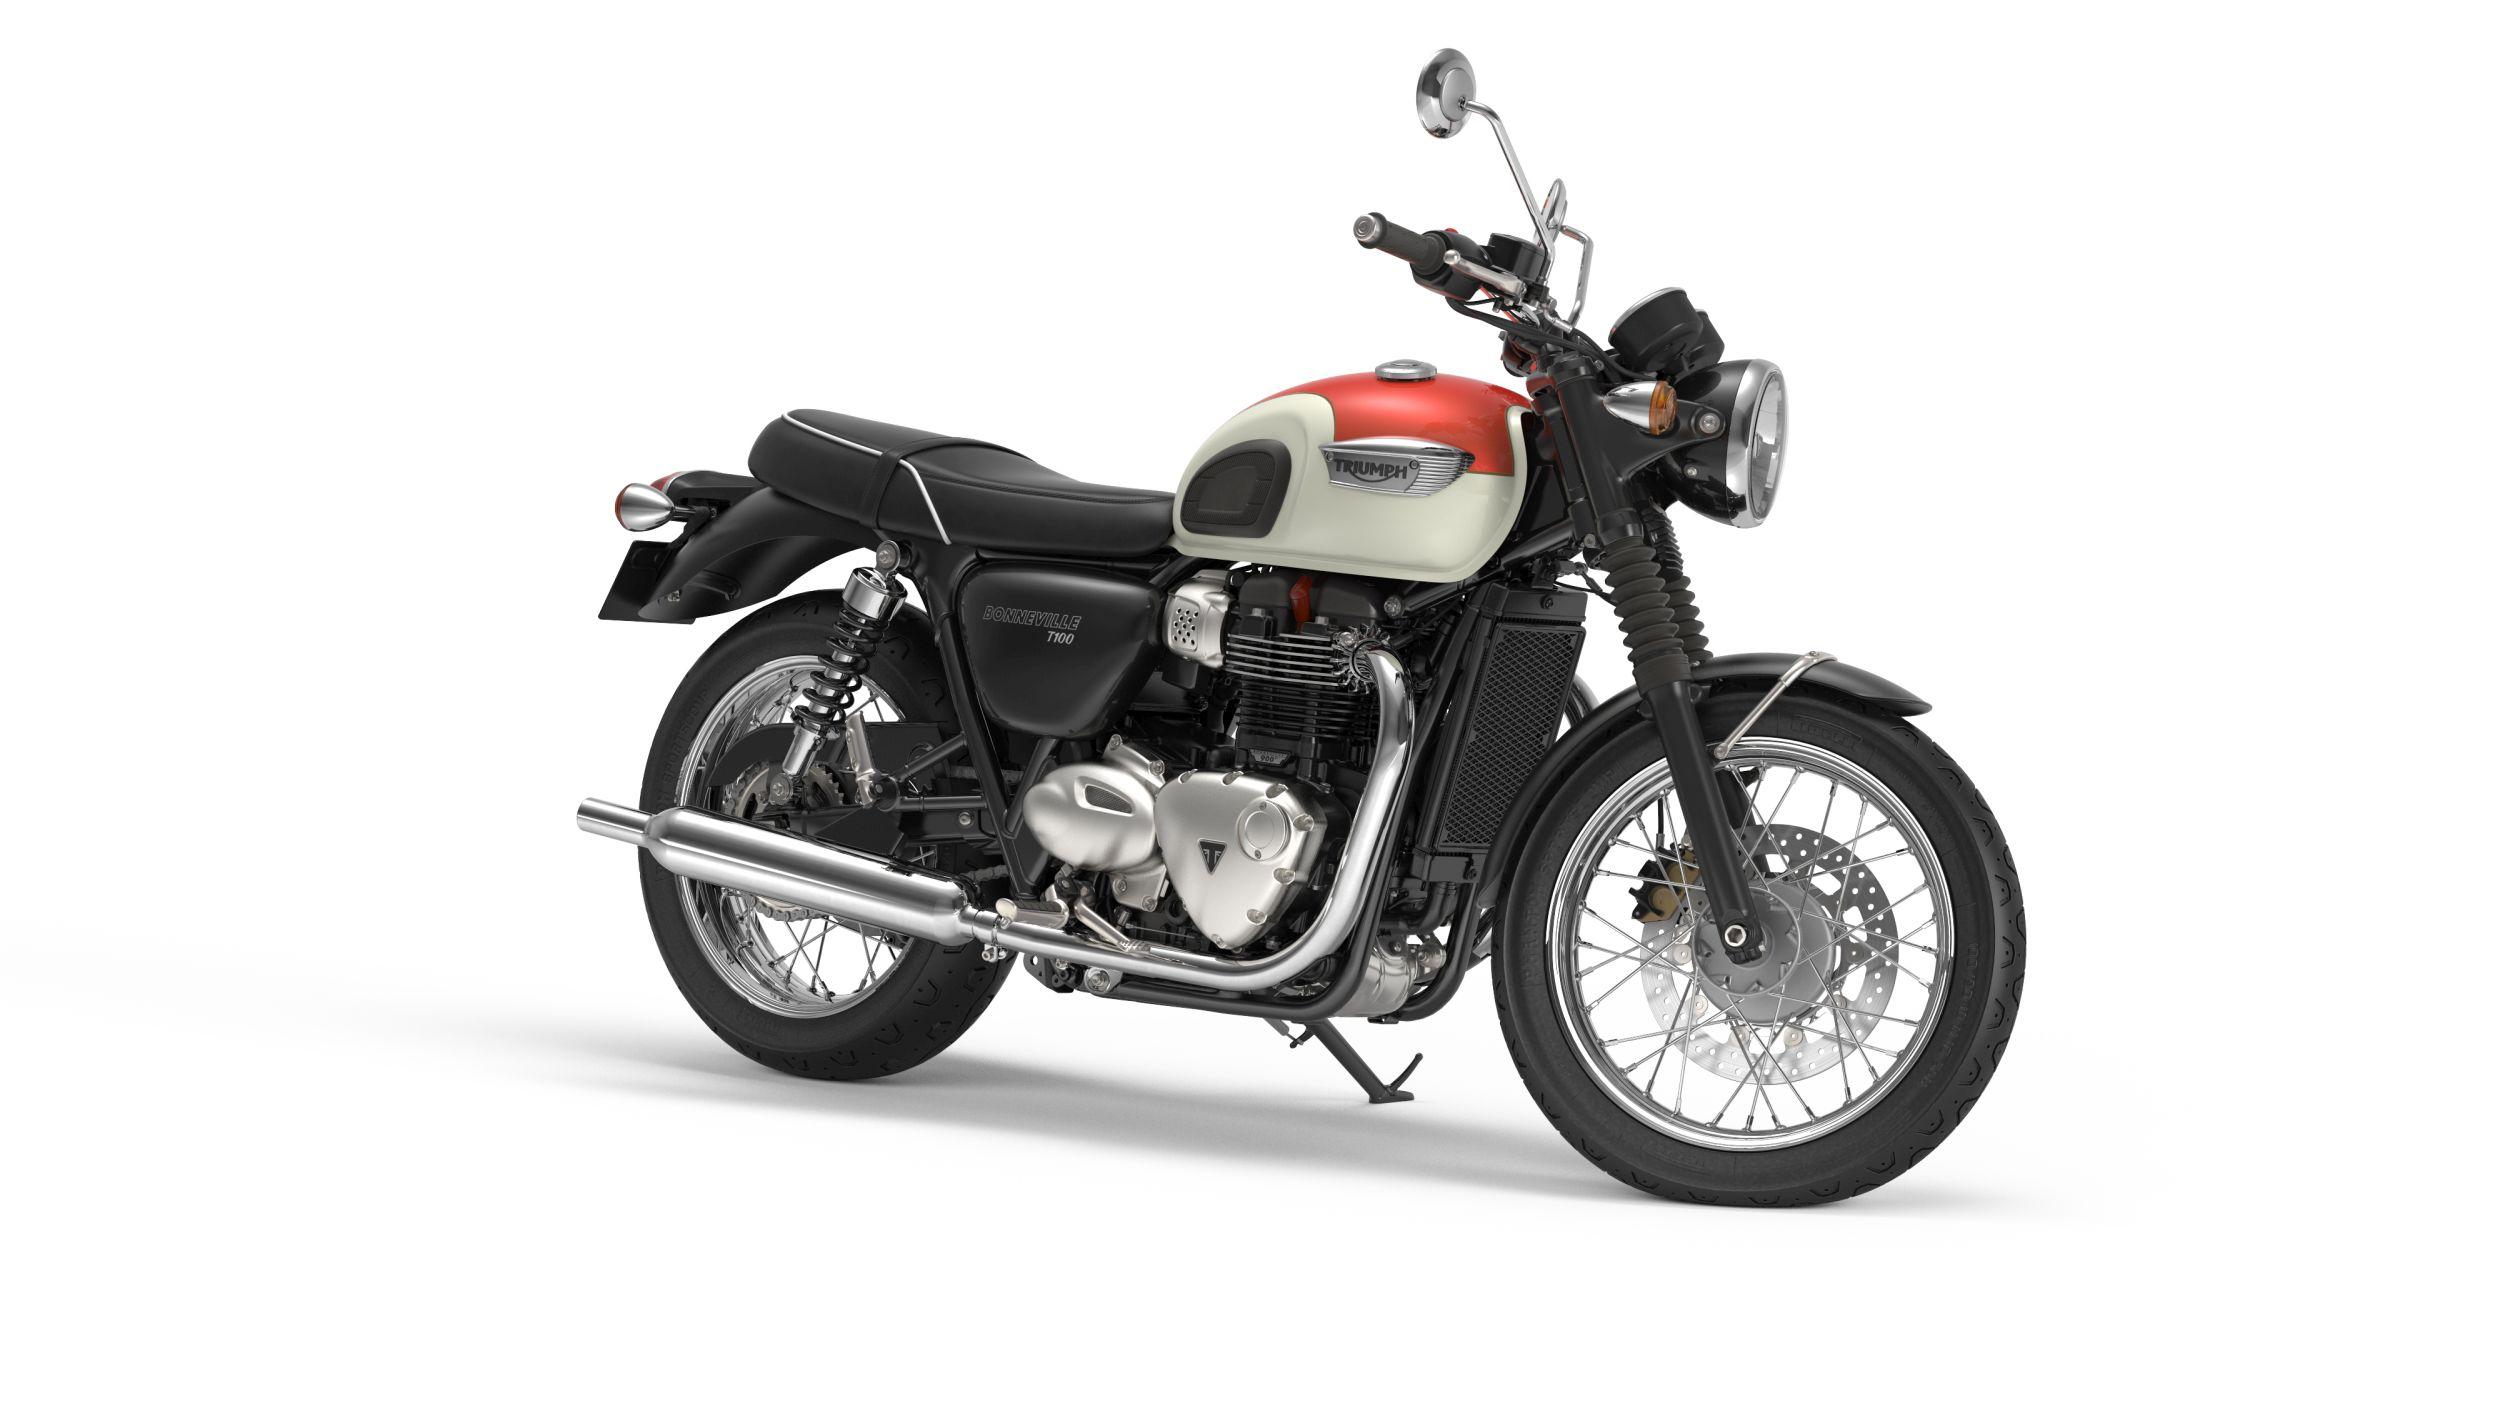 Triumph Bonneville T100 Alle Technischen Daten Zum Modell